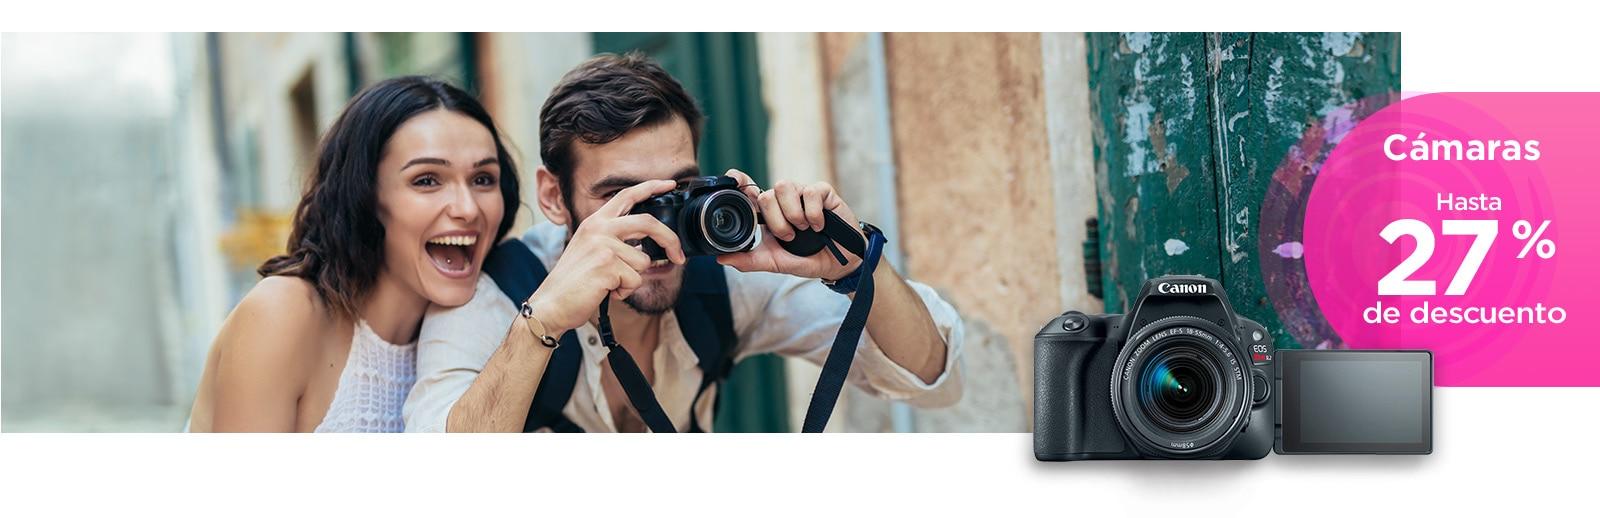 Cámaras, Videocámaras, Acción, GoPro, Reflex, Lentes, Instax, Tripie, Cámara digital, flash, 300mm, 35mm, 24mm, 50mm, Fotocine